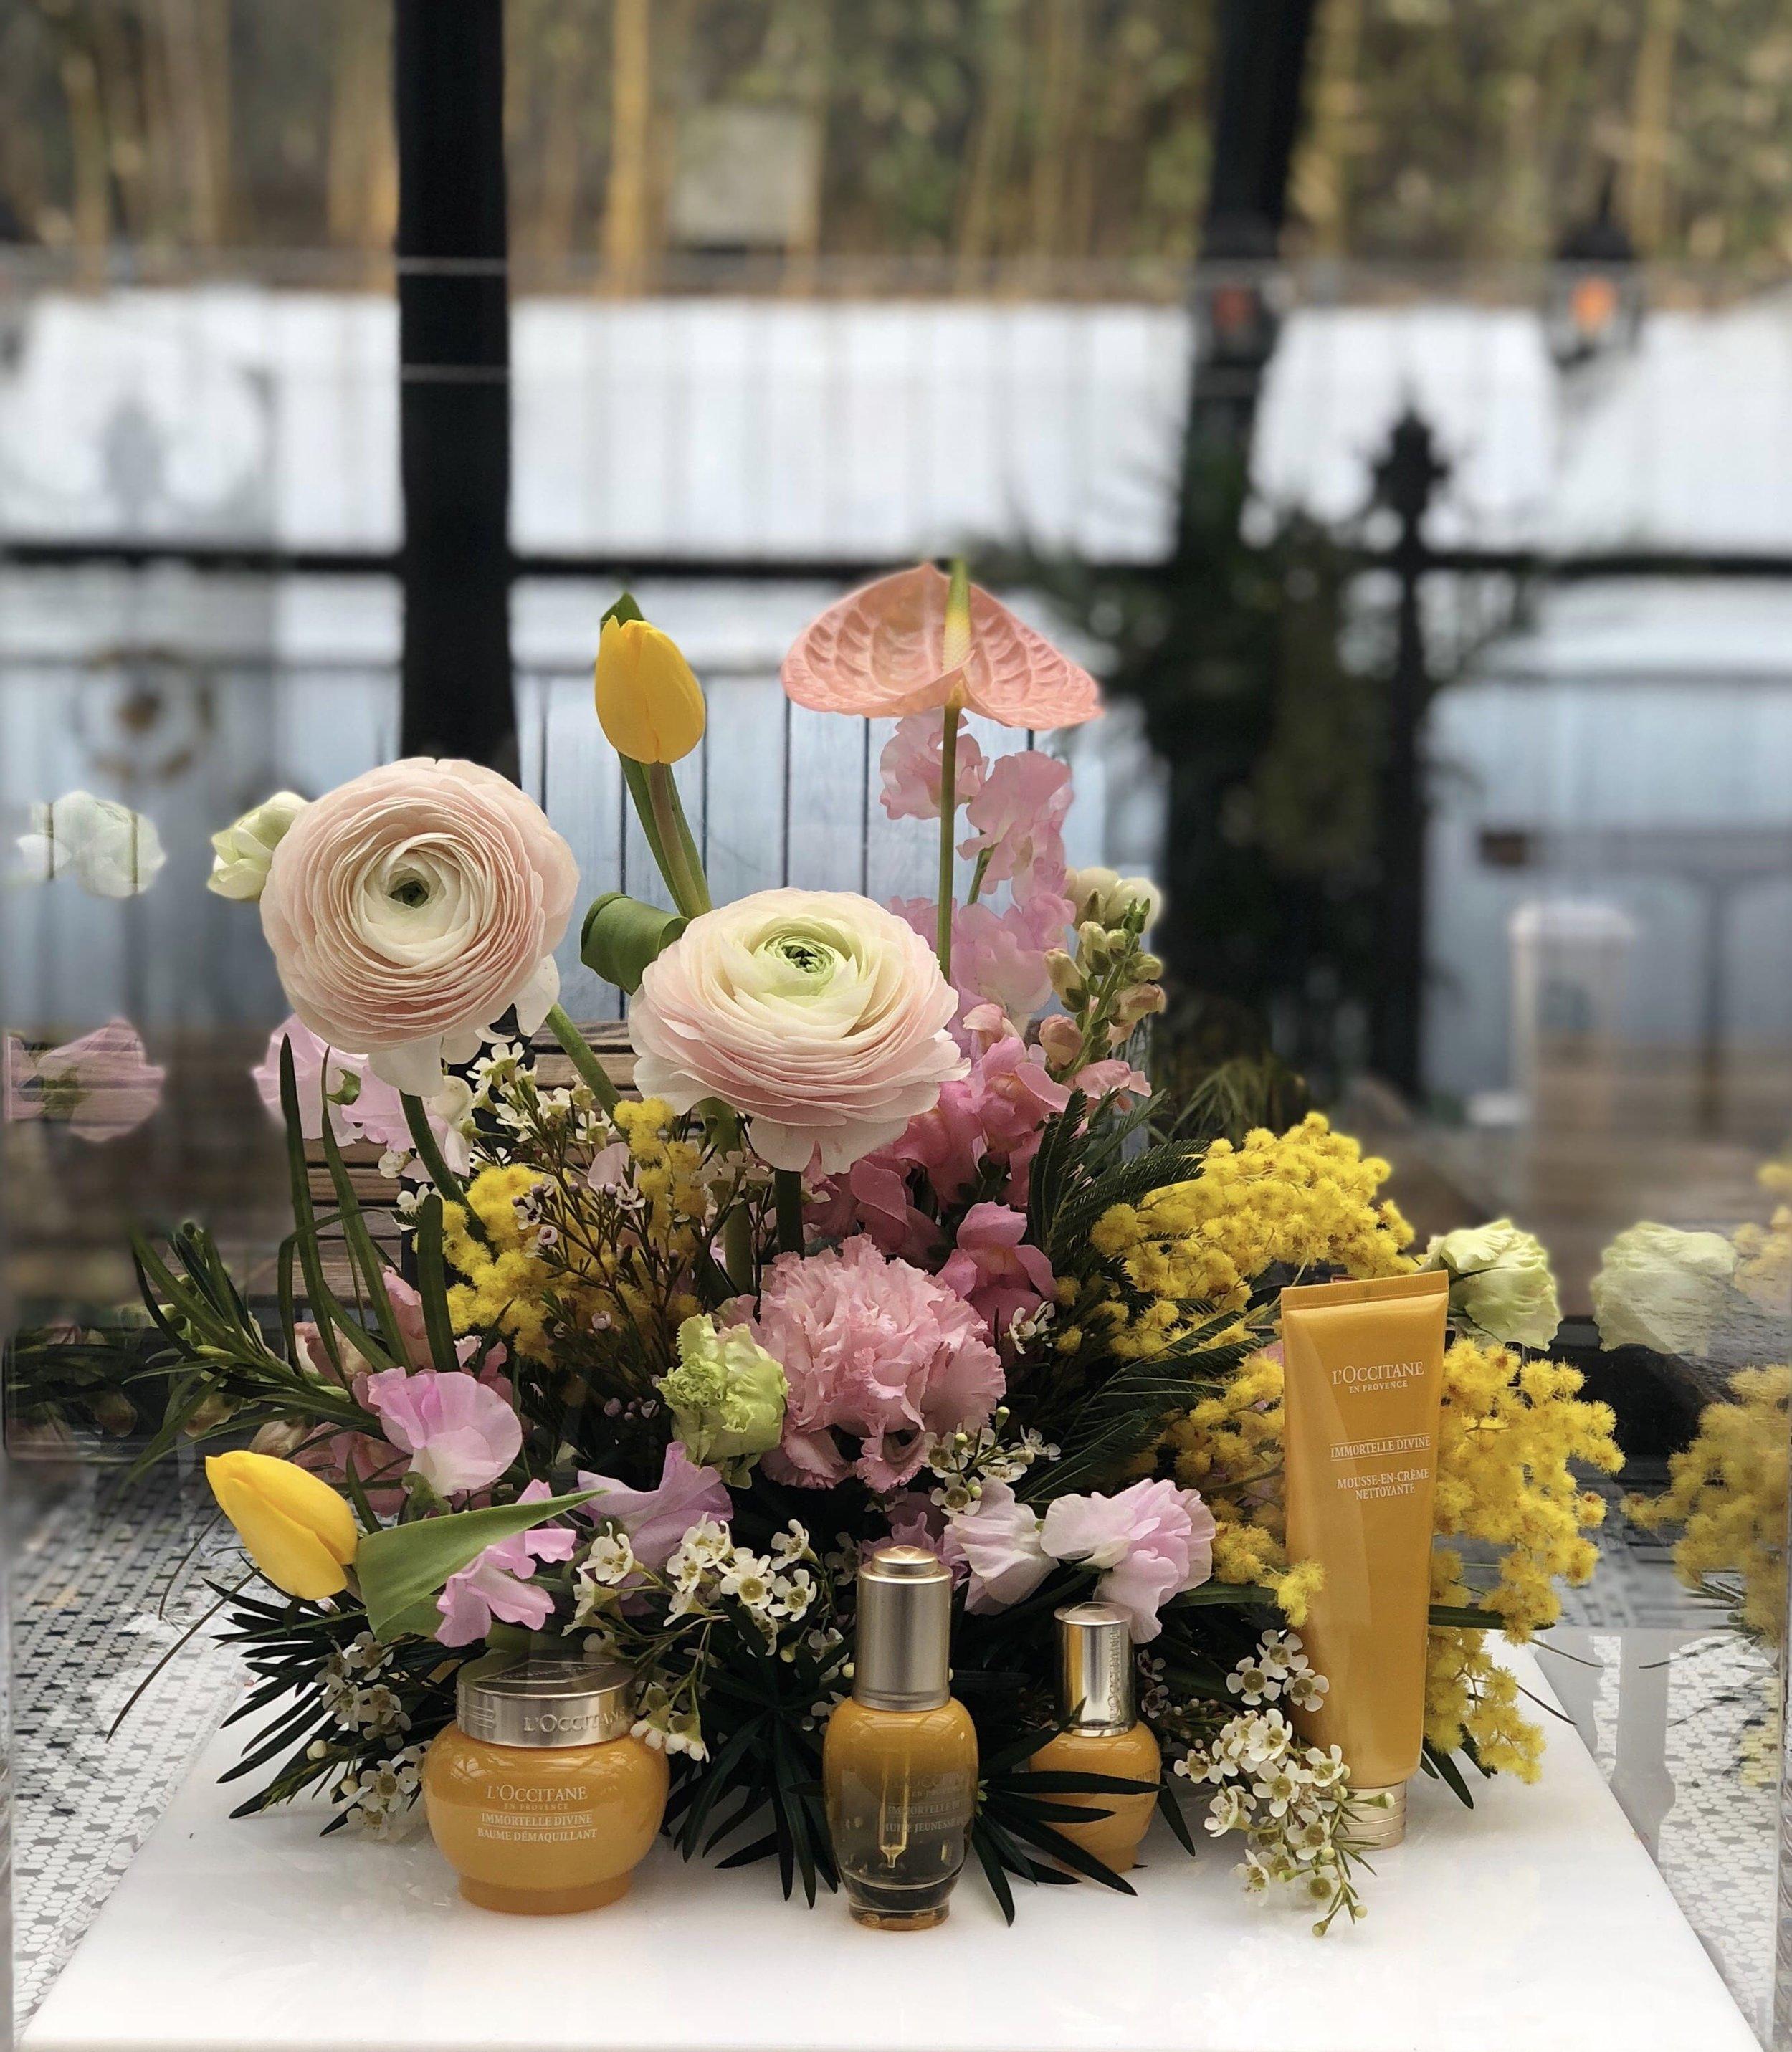 L'Occitane Product Display - B Floral